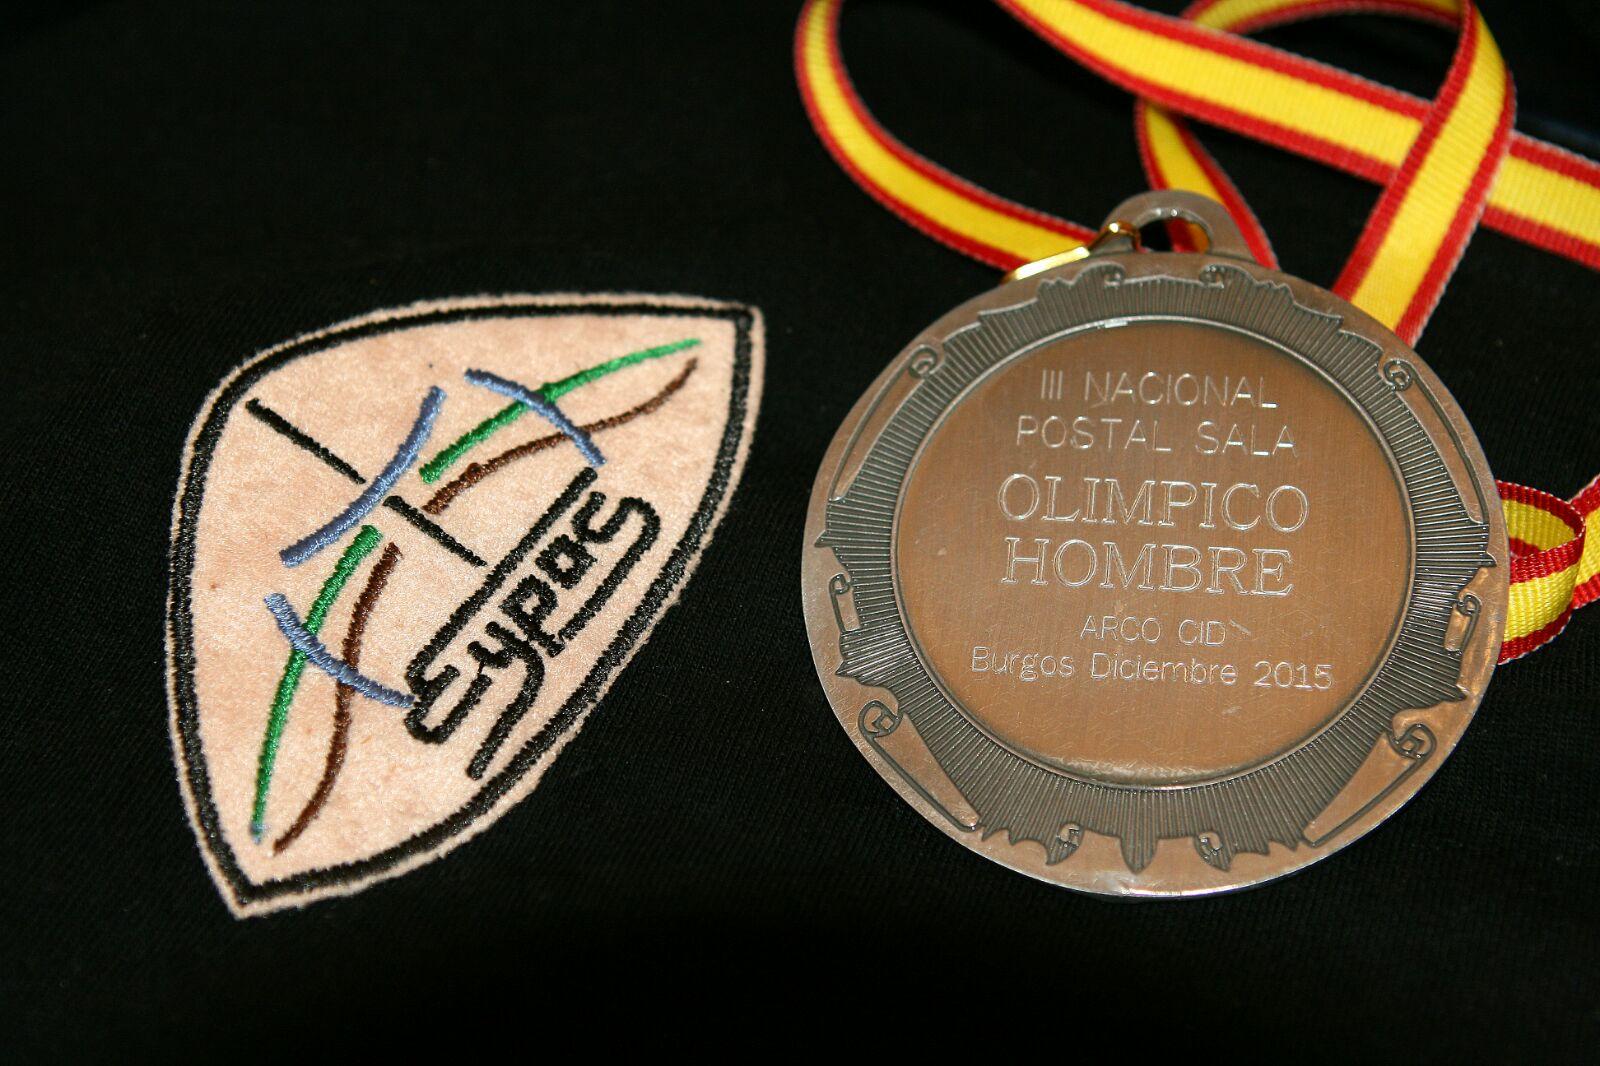 Alberto Ibergallartu – Medalla de Plata